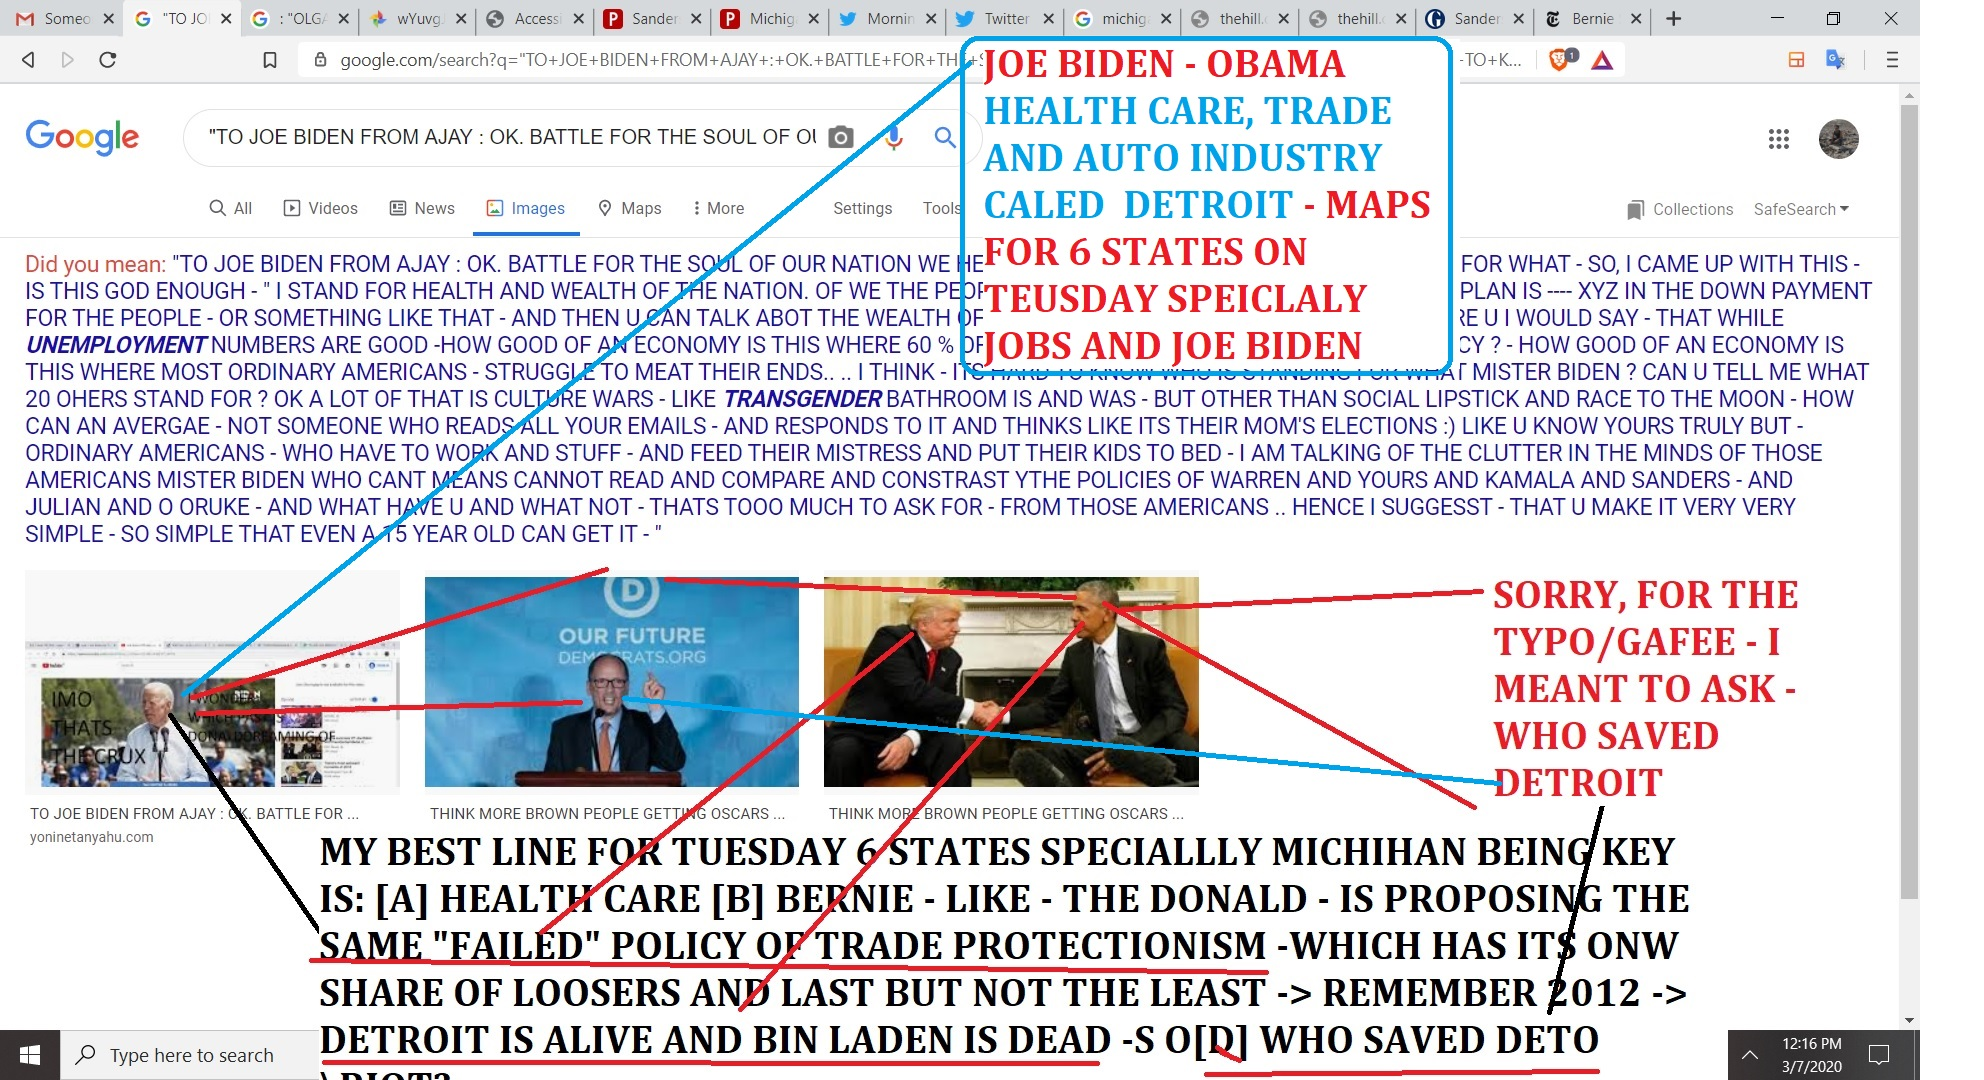 JOE BIDEN - OBMAA HEALTH CARE, TARDE AND AUTO INDURTY CALED DETROIT - MAPS FOR 6 STATES ON TEUSDAY SPEICLALY JOBS AND JOE BIDEN